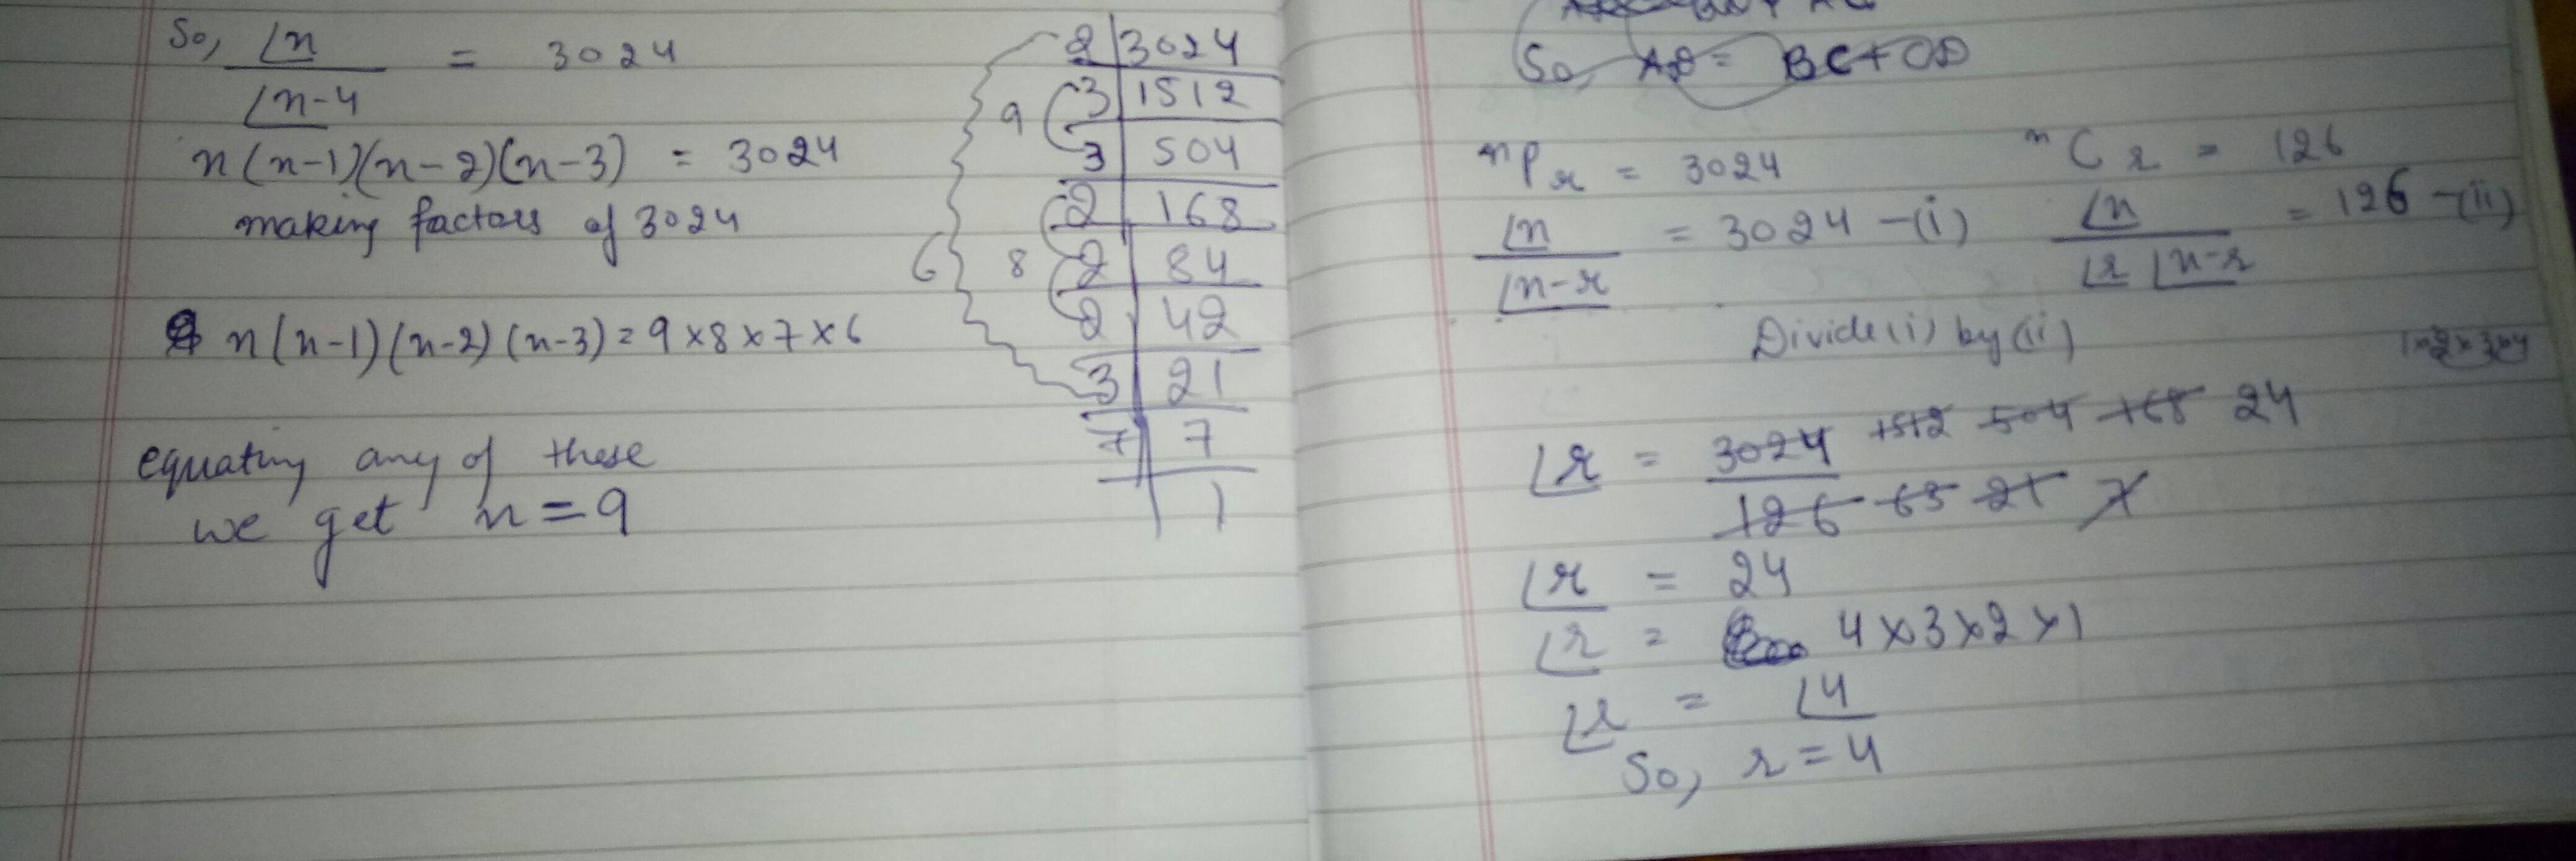 npr=3024 ncr =126 find n &